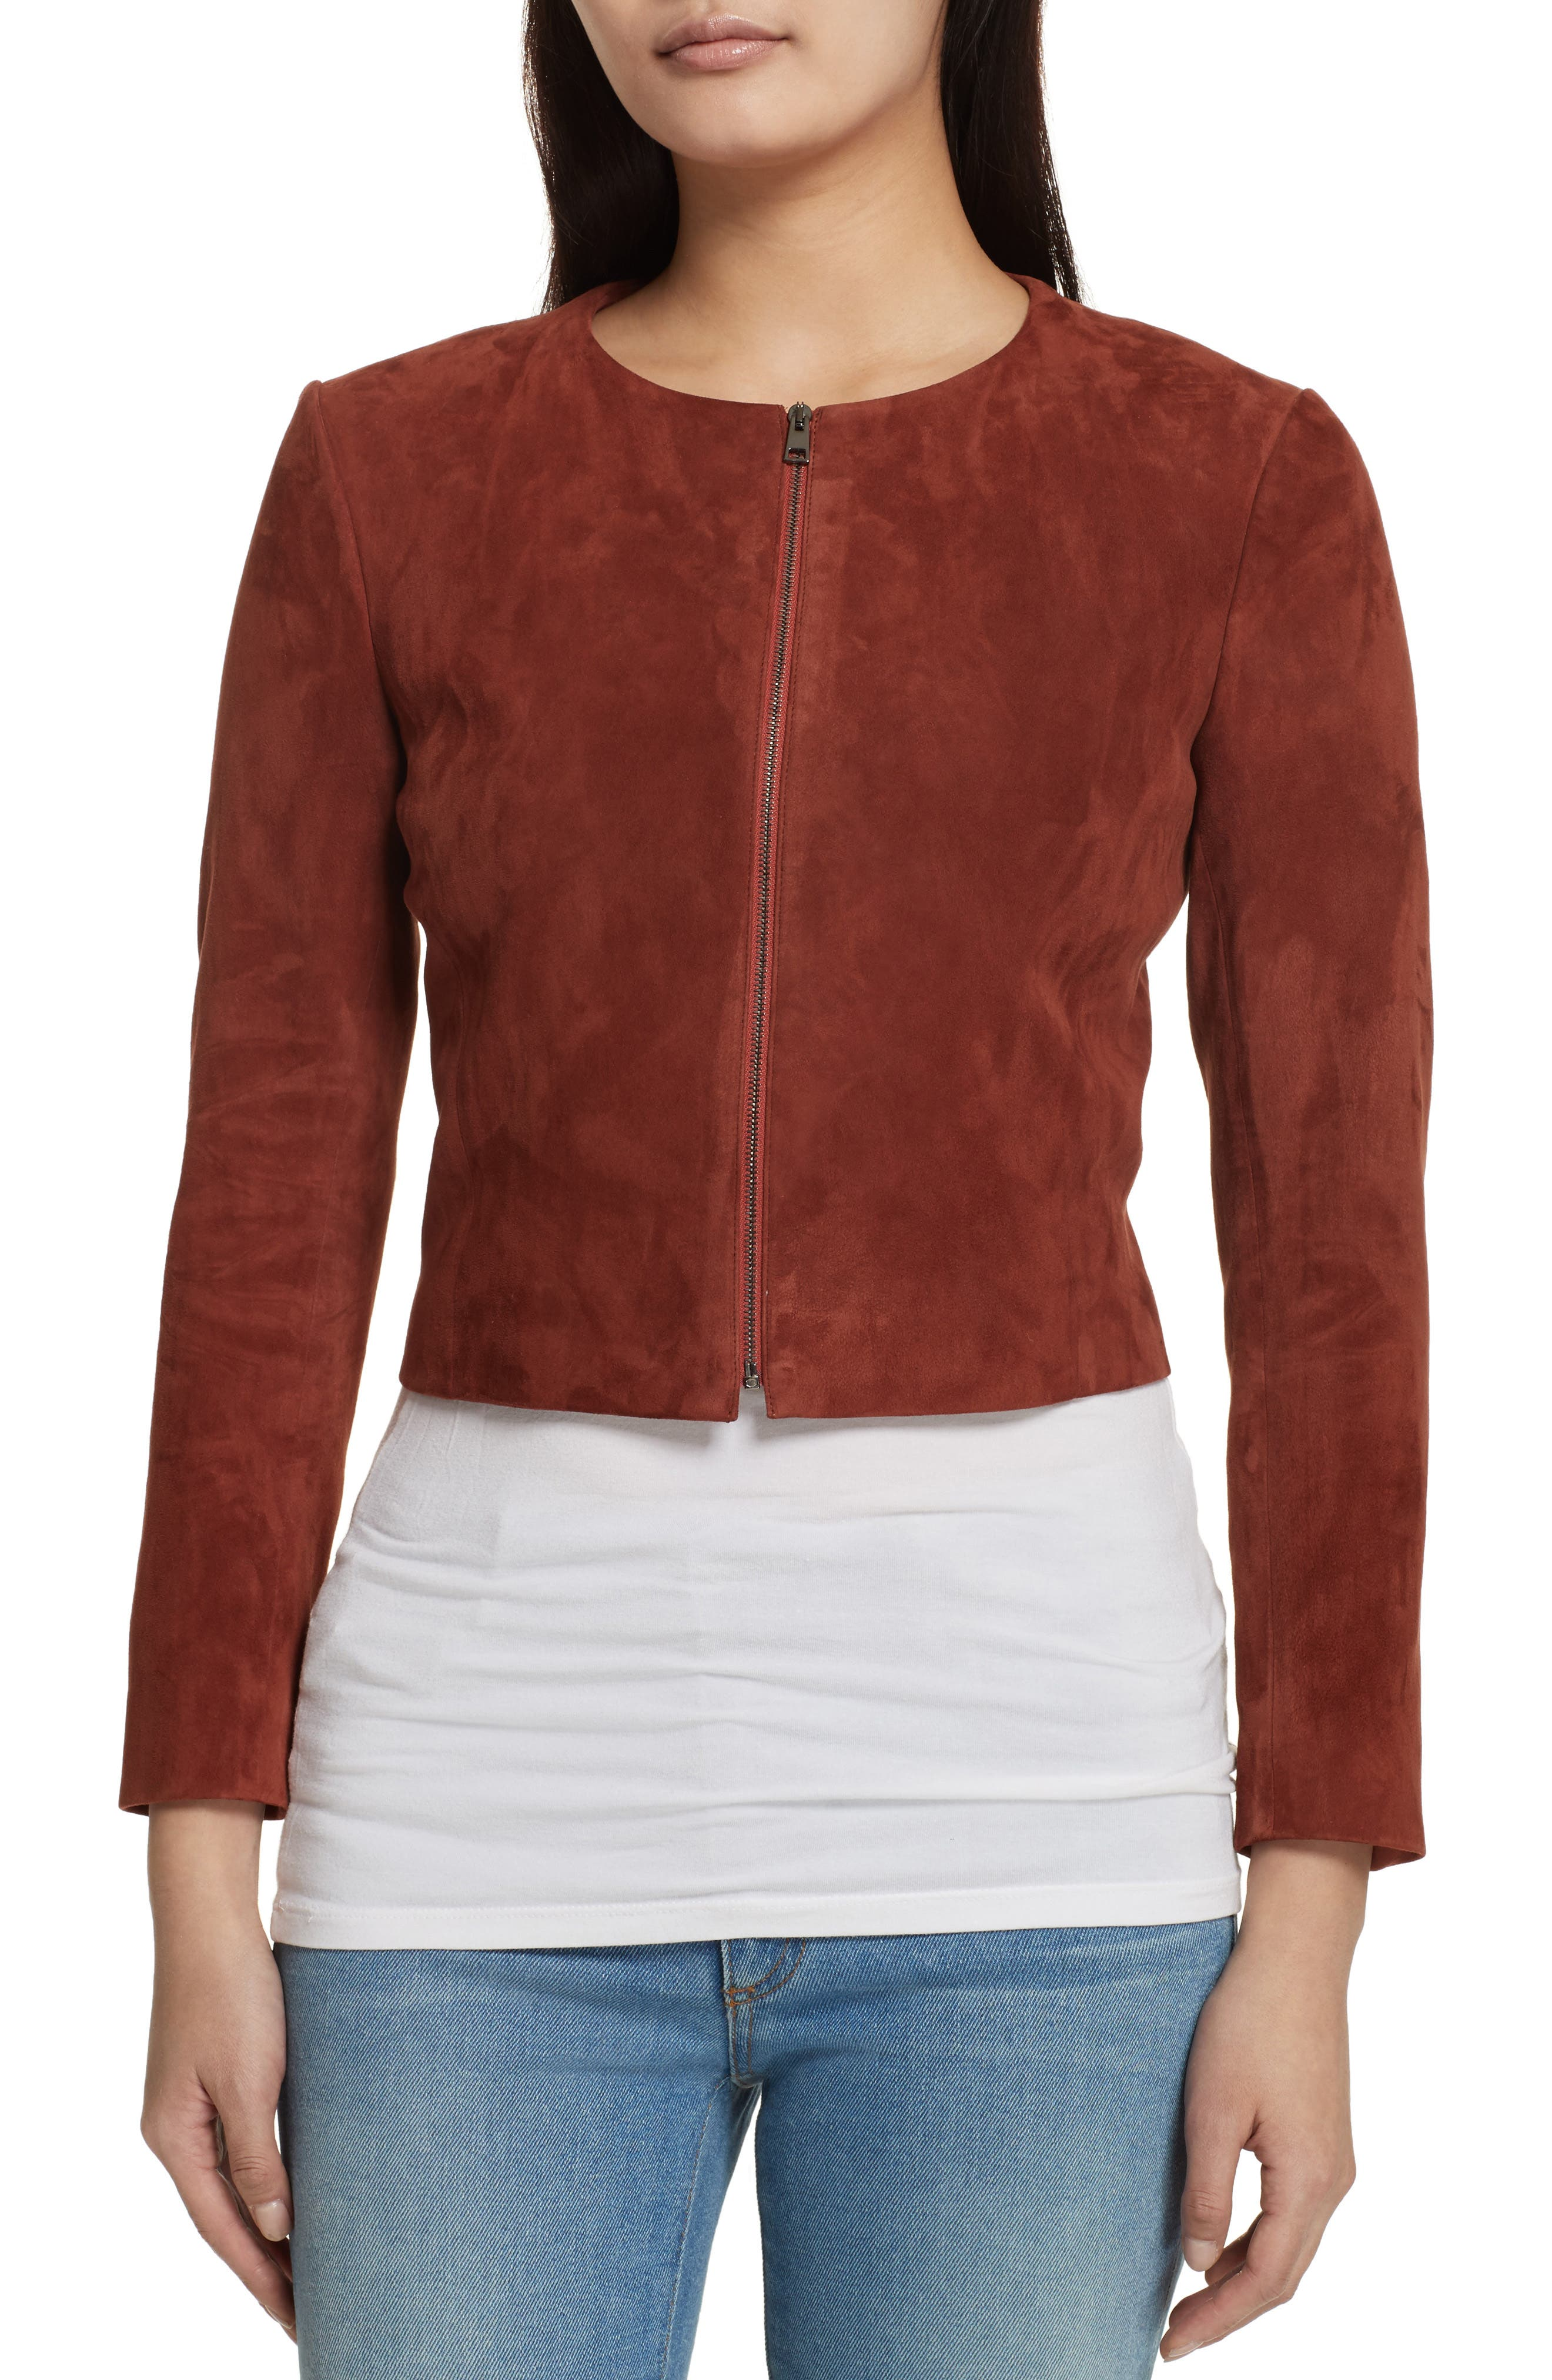 Morene Stretch Suede Jacket,                             Alternate thumbnail 4, color,                             Brown Russet